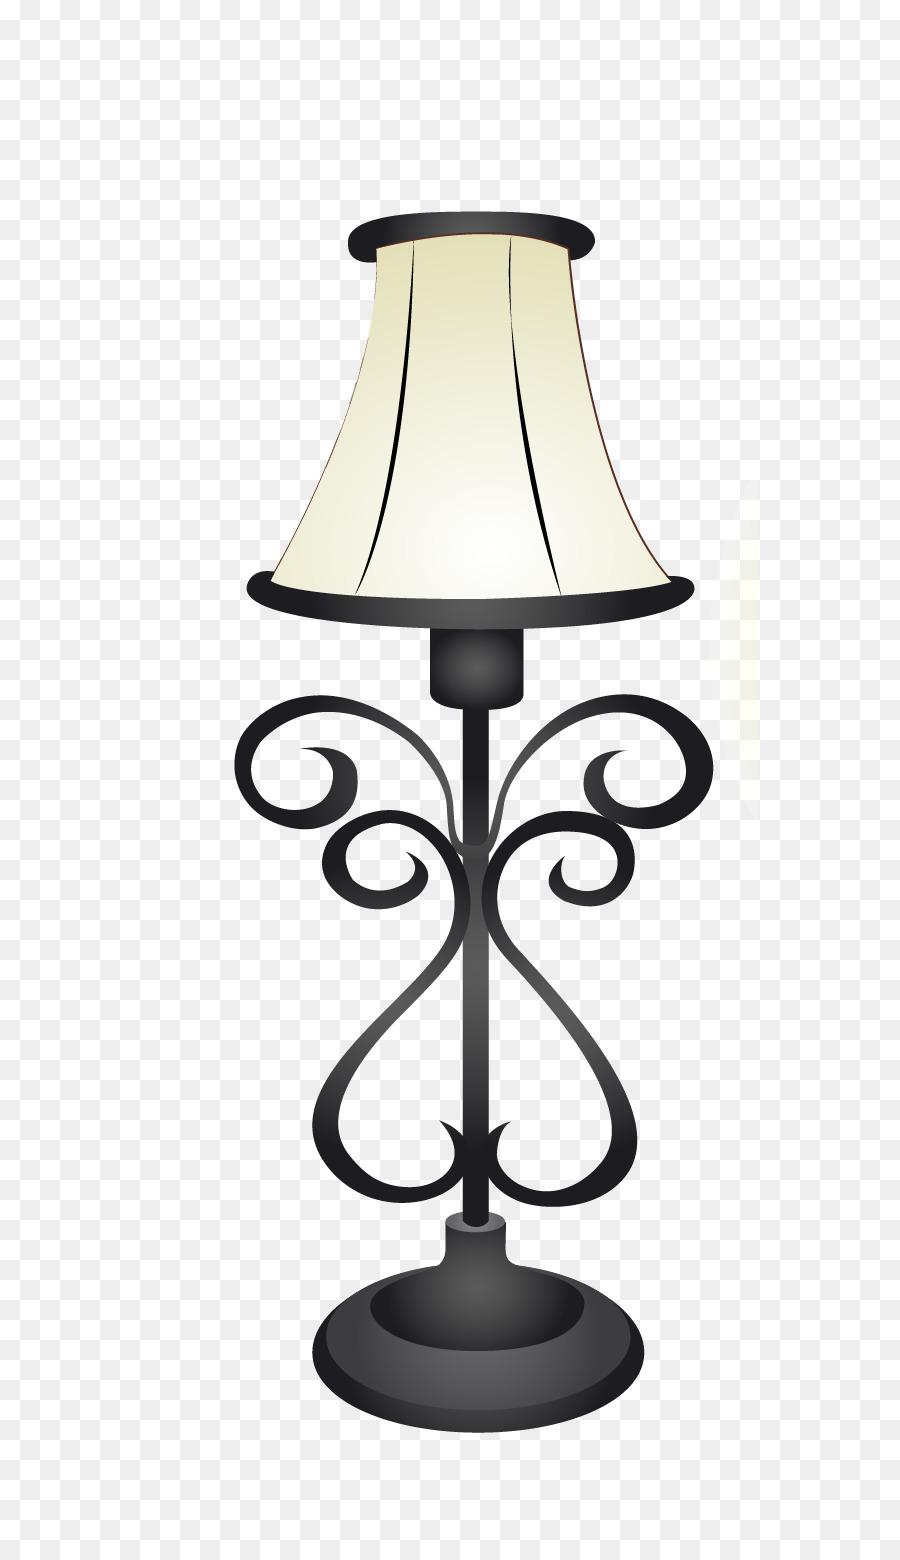 Lamp Drawing - Cartoon Lamps png download - 616*1542 - Free ... for candle lamp drawing  14lpgtk